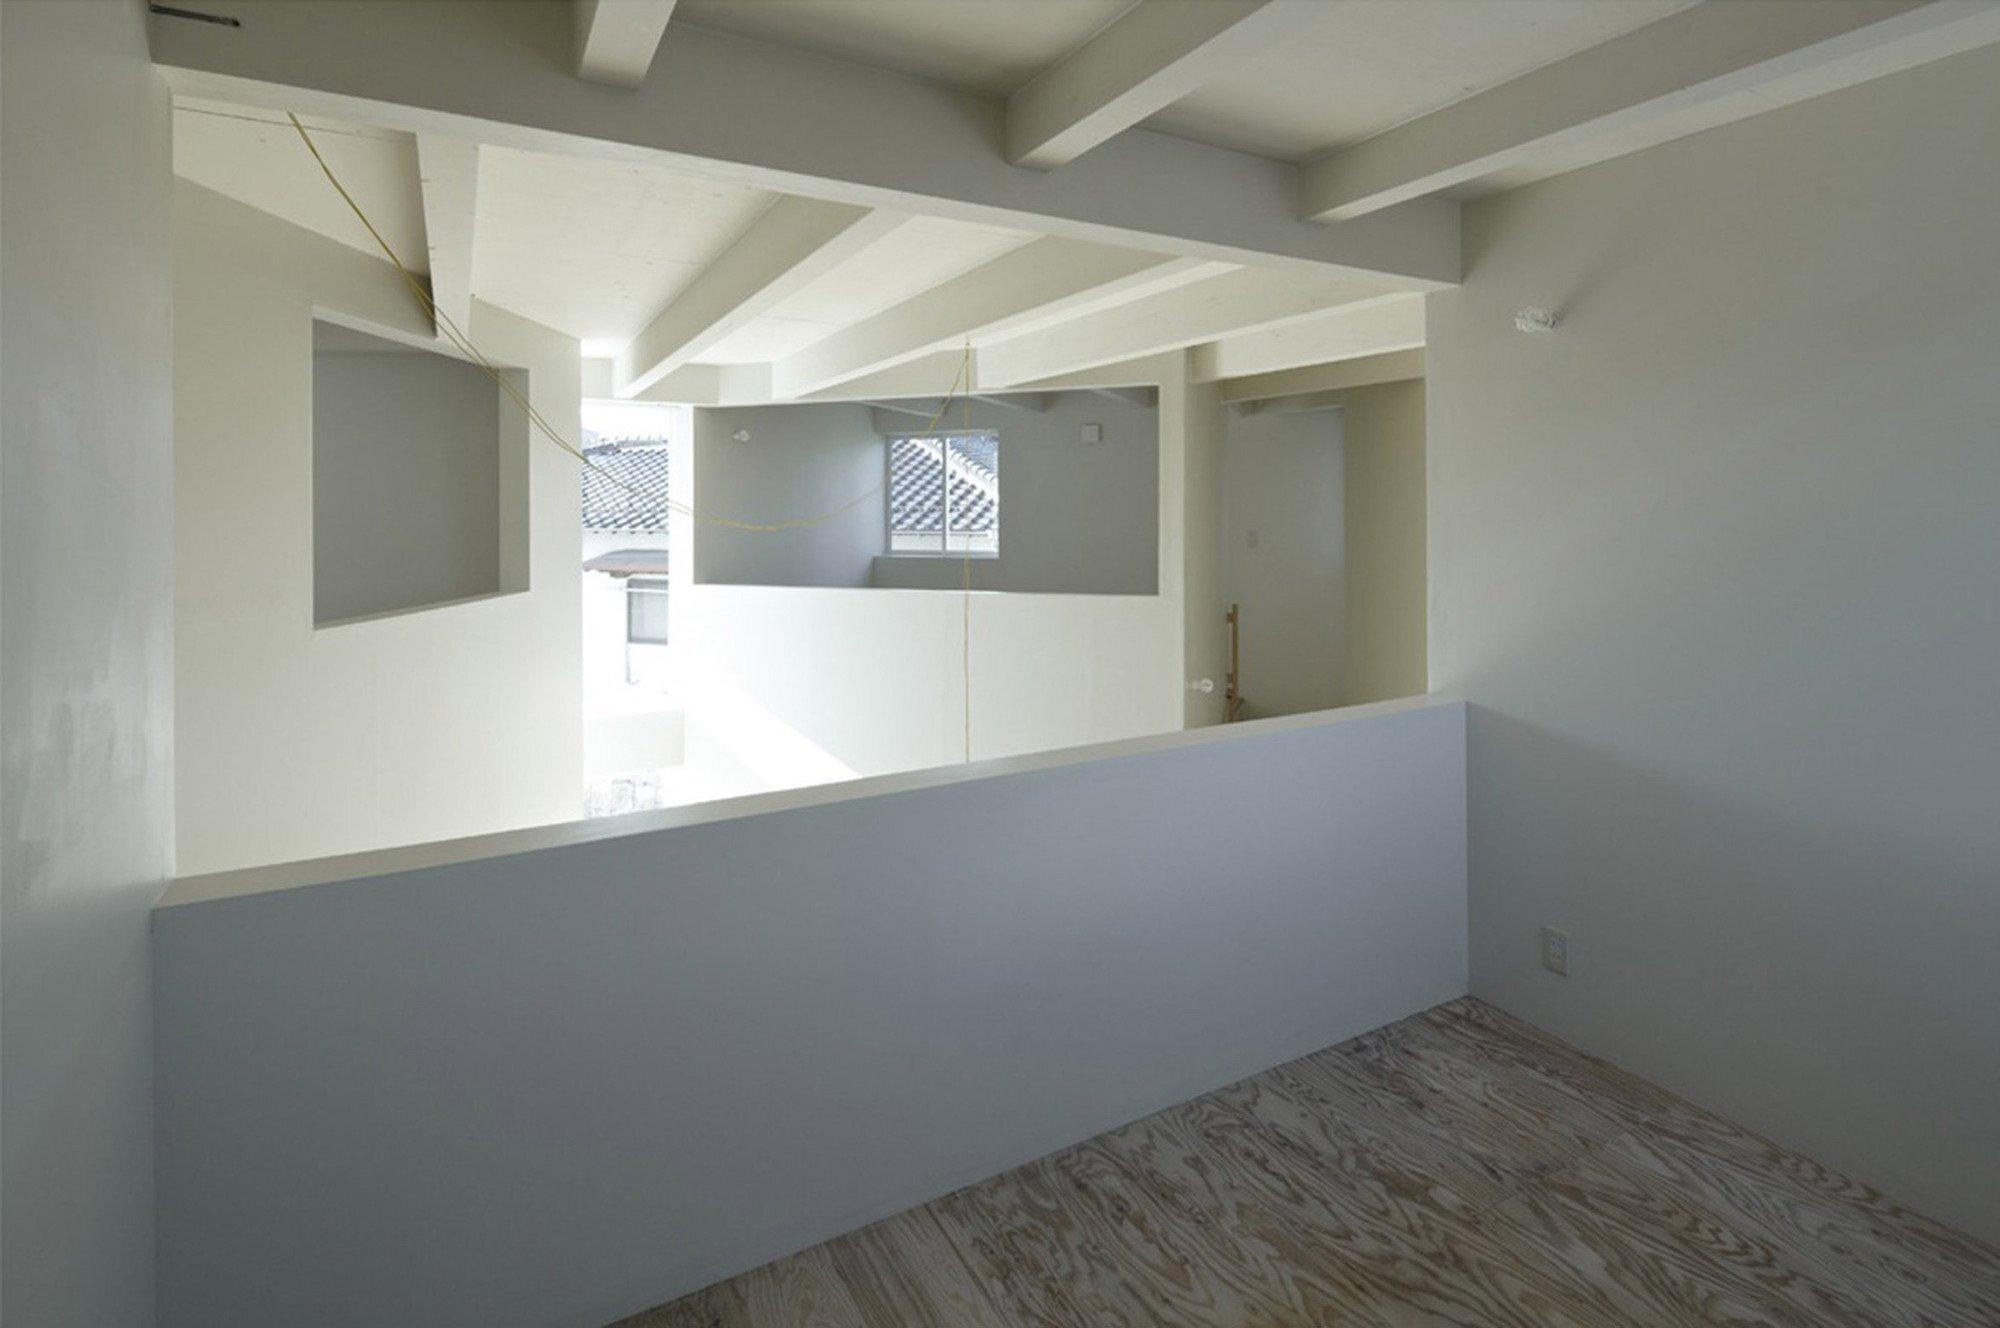 House In Iizuka - Japanese House - Rhythmdesign - Bedroom - Humble Homes